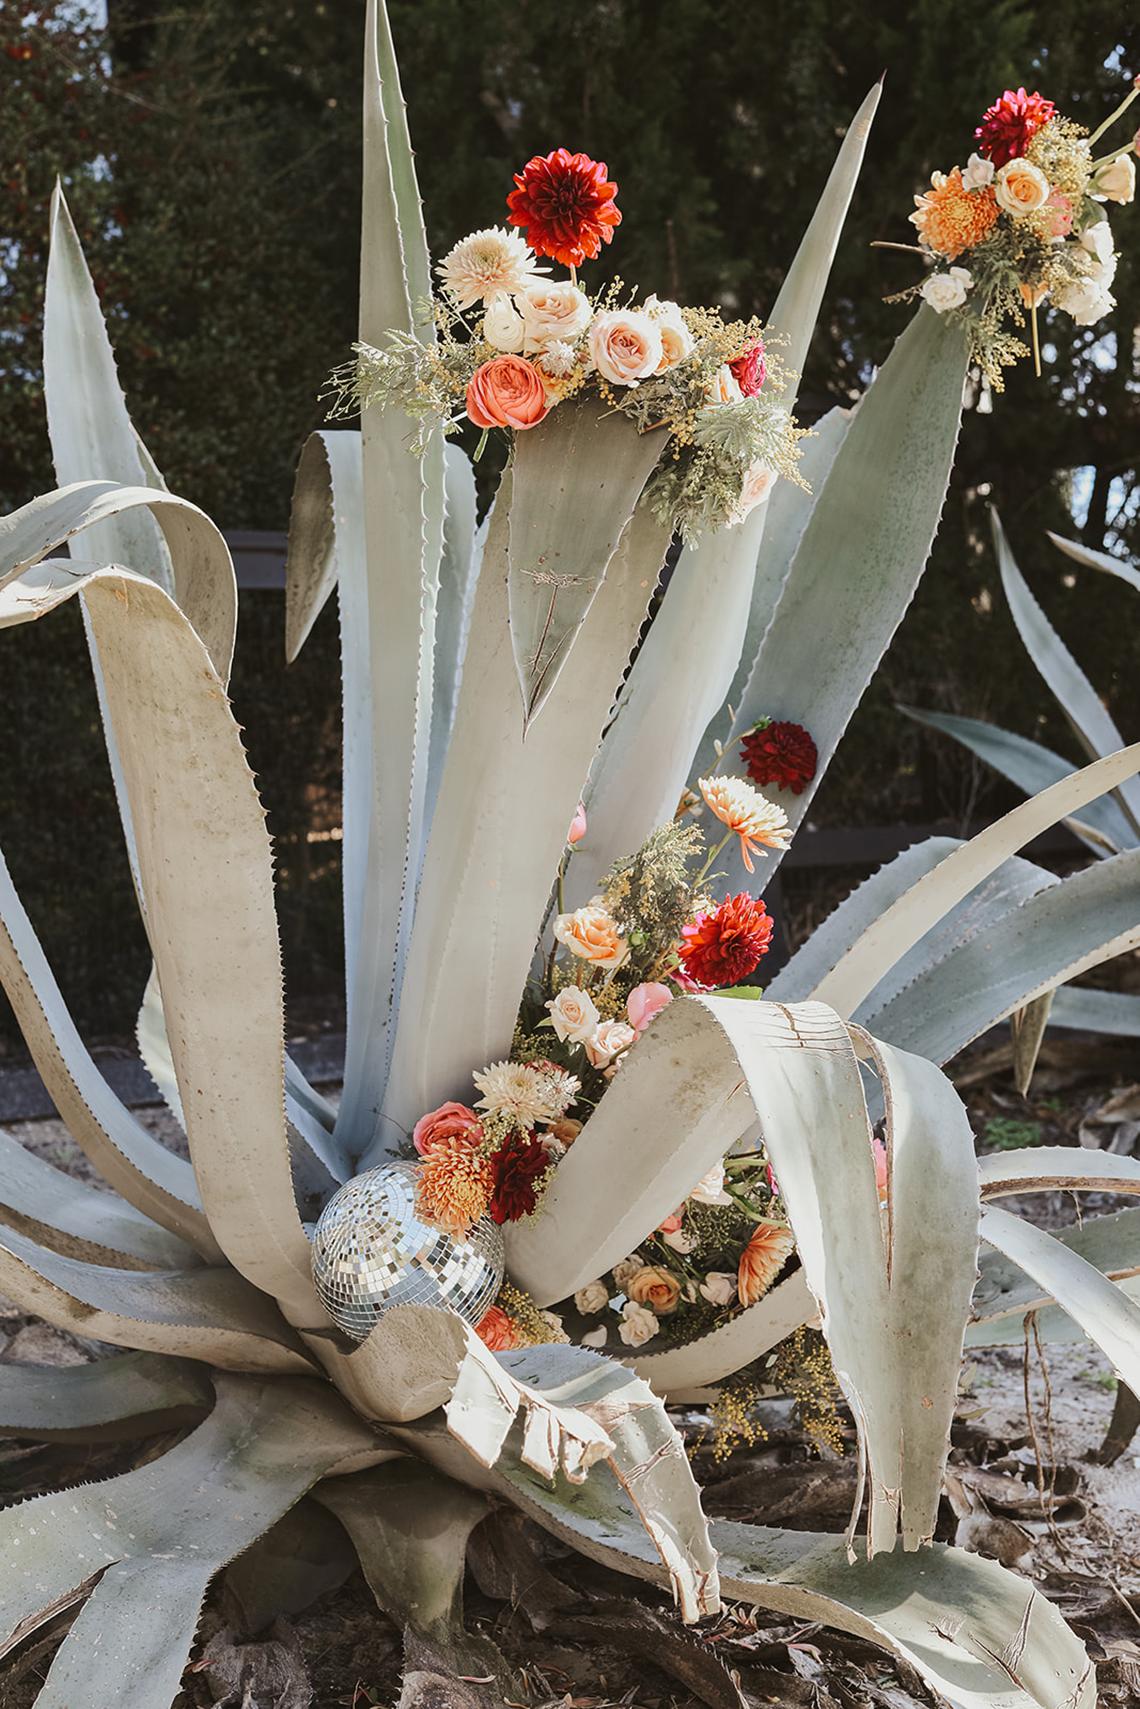 Bohemian Beach Wedding Inspiration With Agave Decor – Georgia Grace – Salt and Stem 42